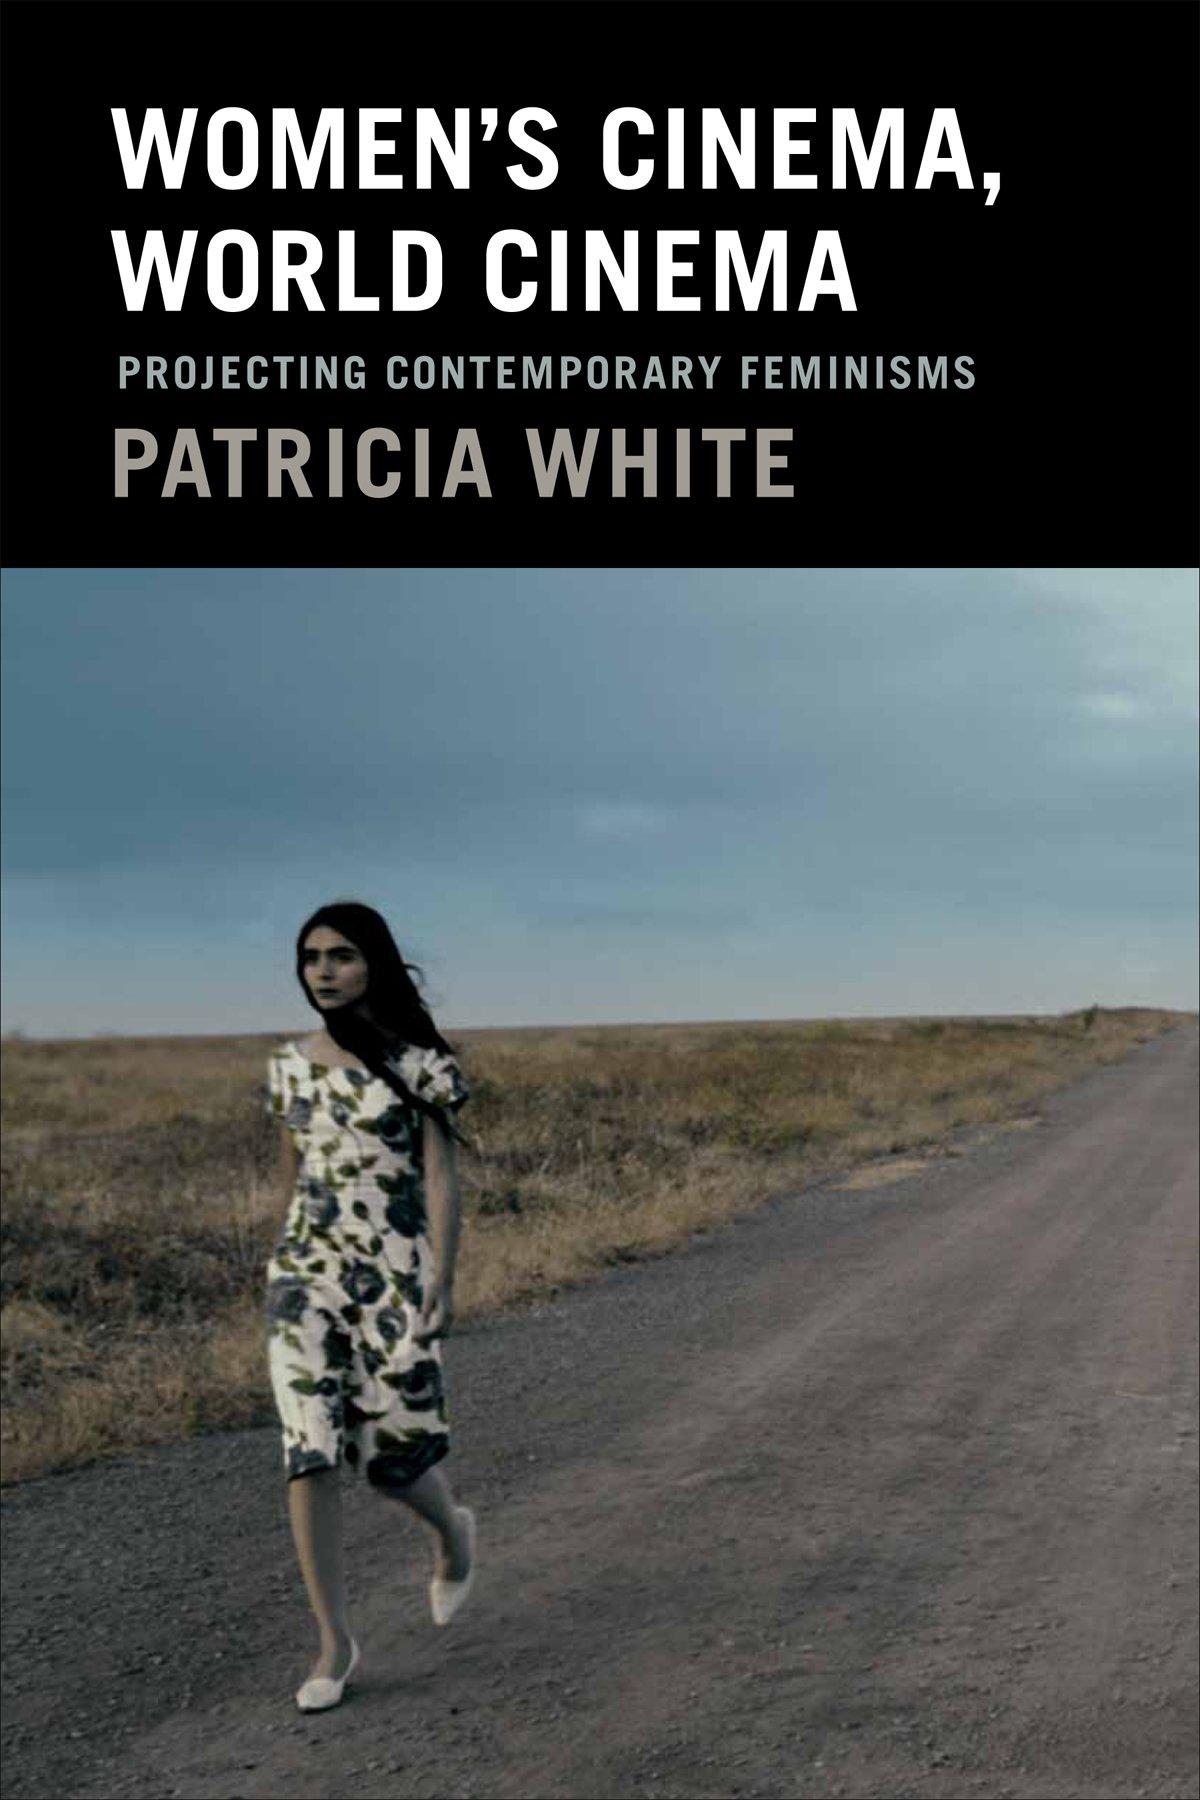 Women's Cinema, World Cinema: Book Reception